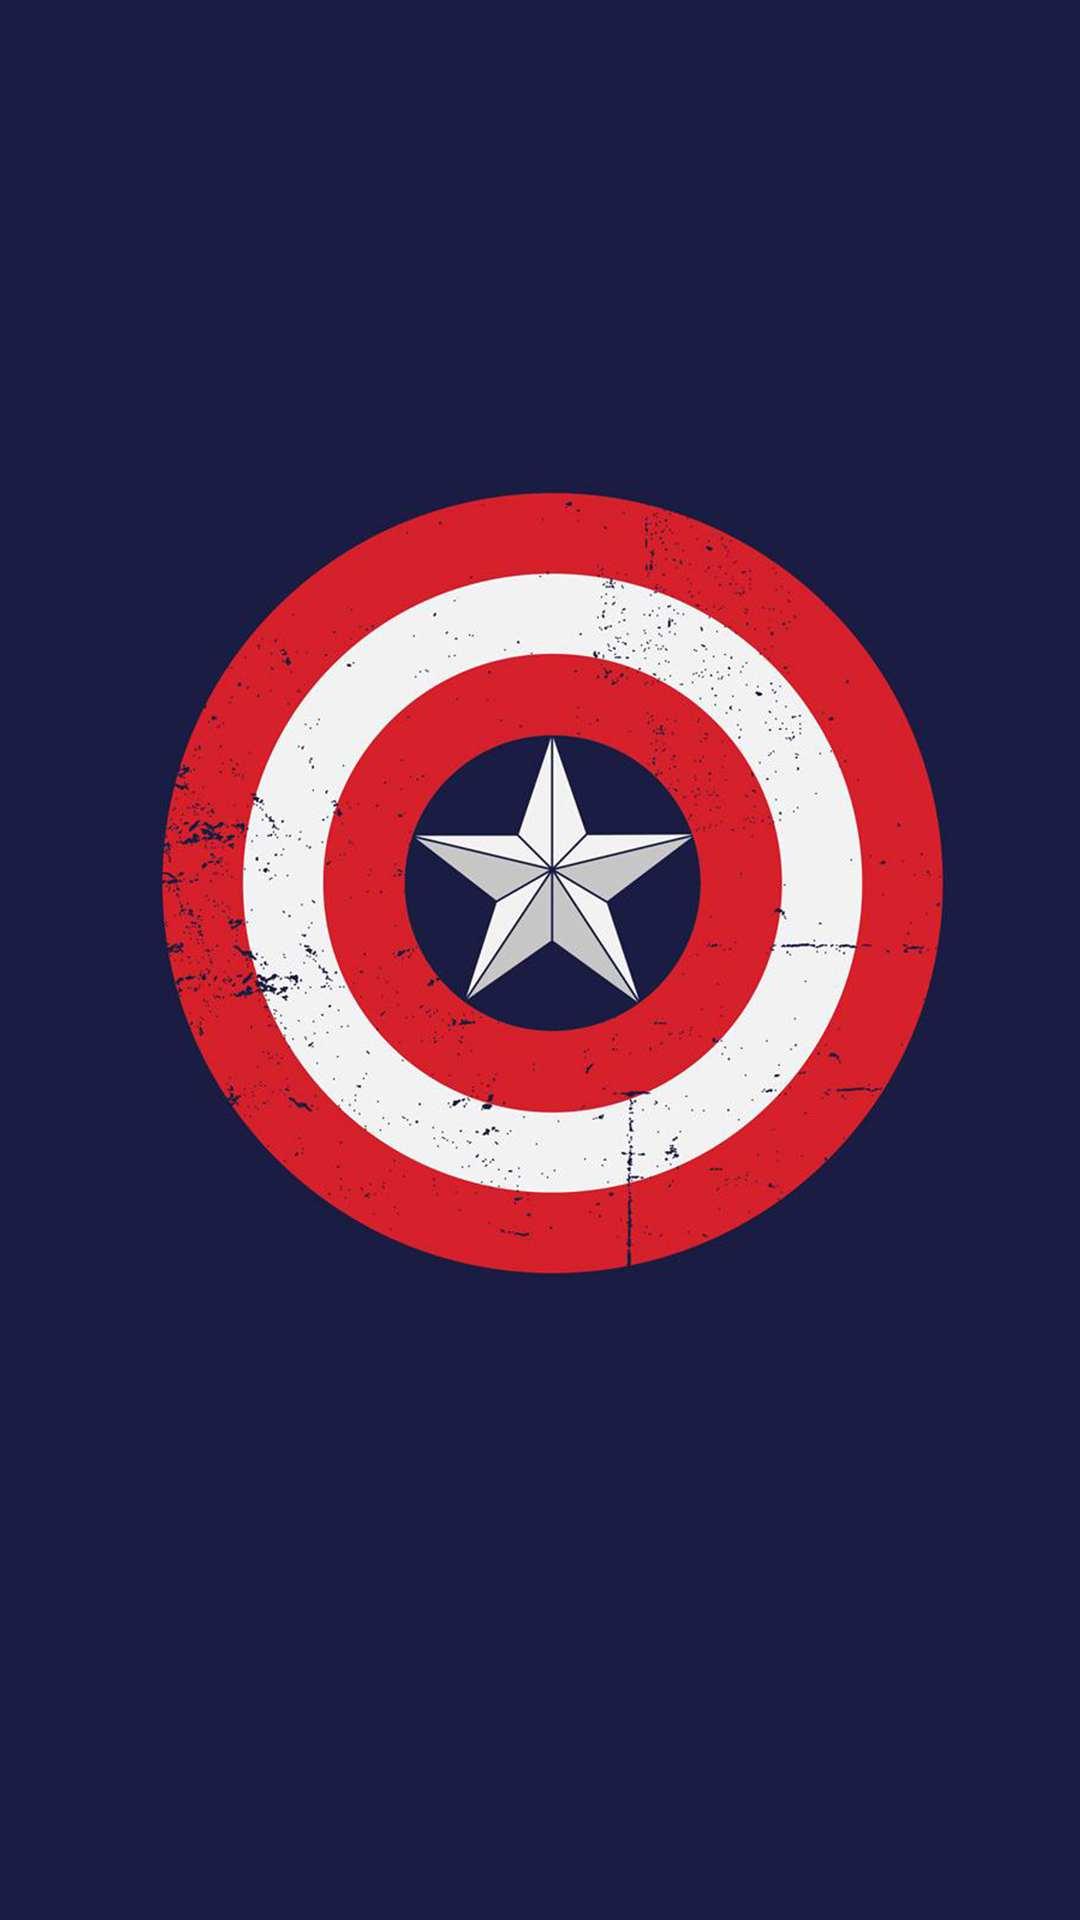 Statue Of Liberty Wallpaper Iphone Captain America Shield Minimal Iphone Wallpaper Iphone